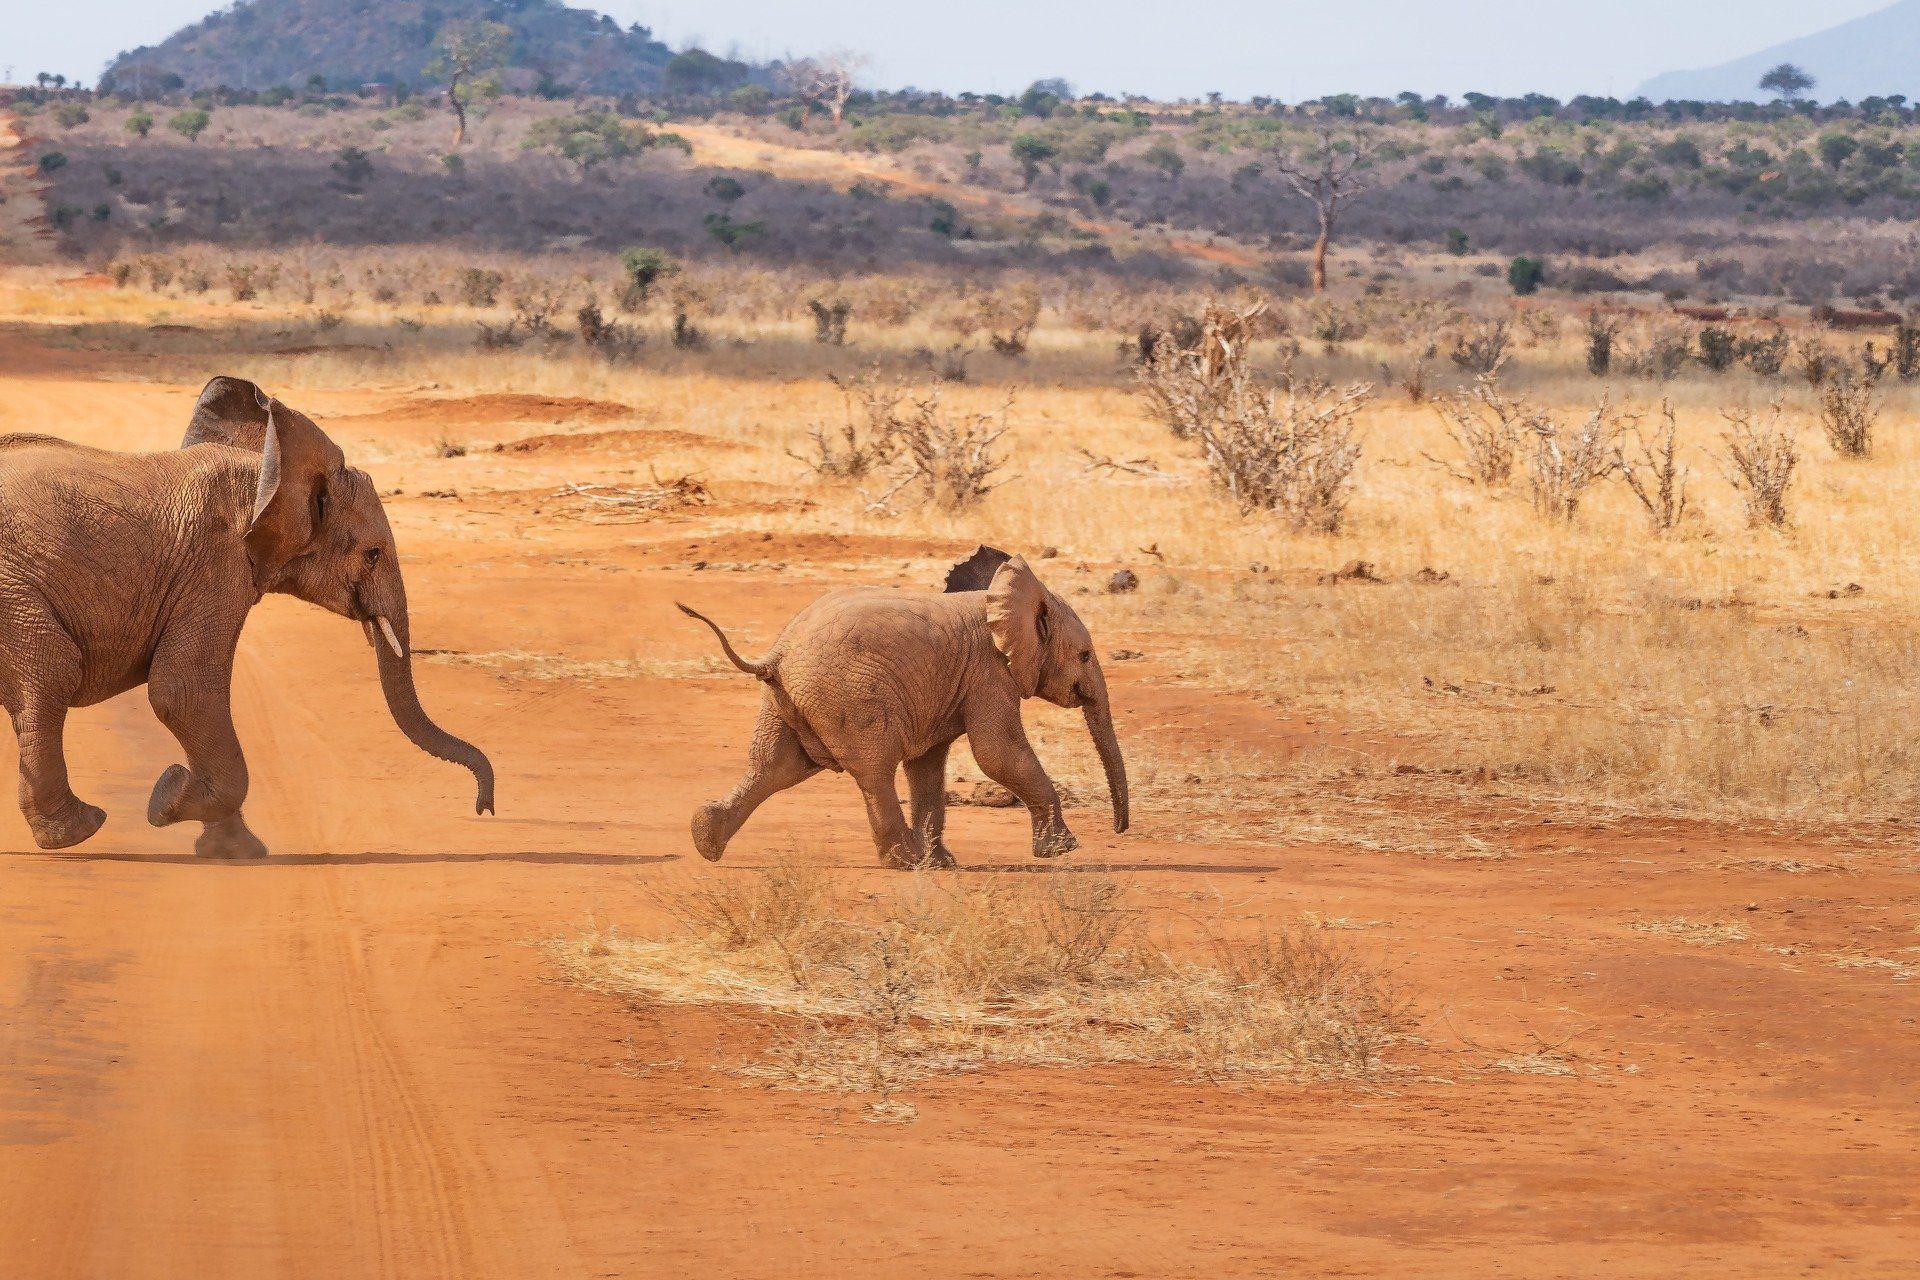 Красивое фото трех белых слонов на водопое